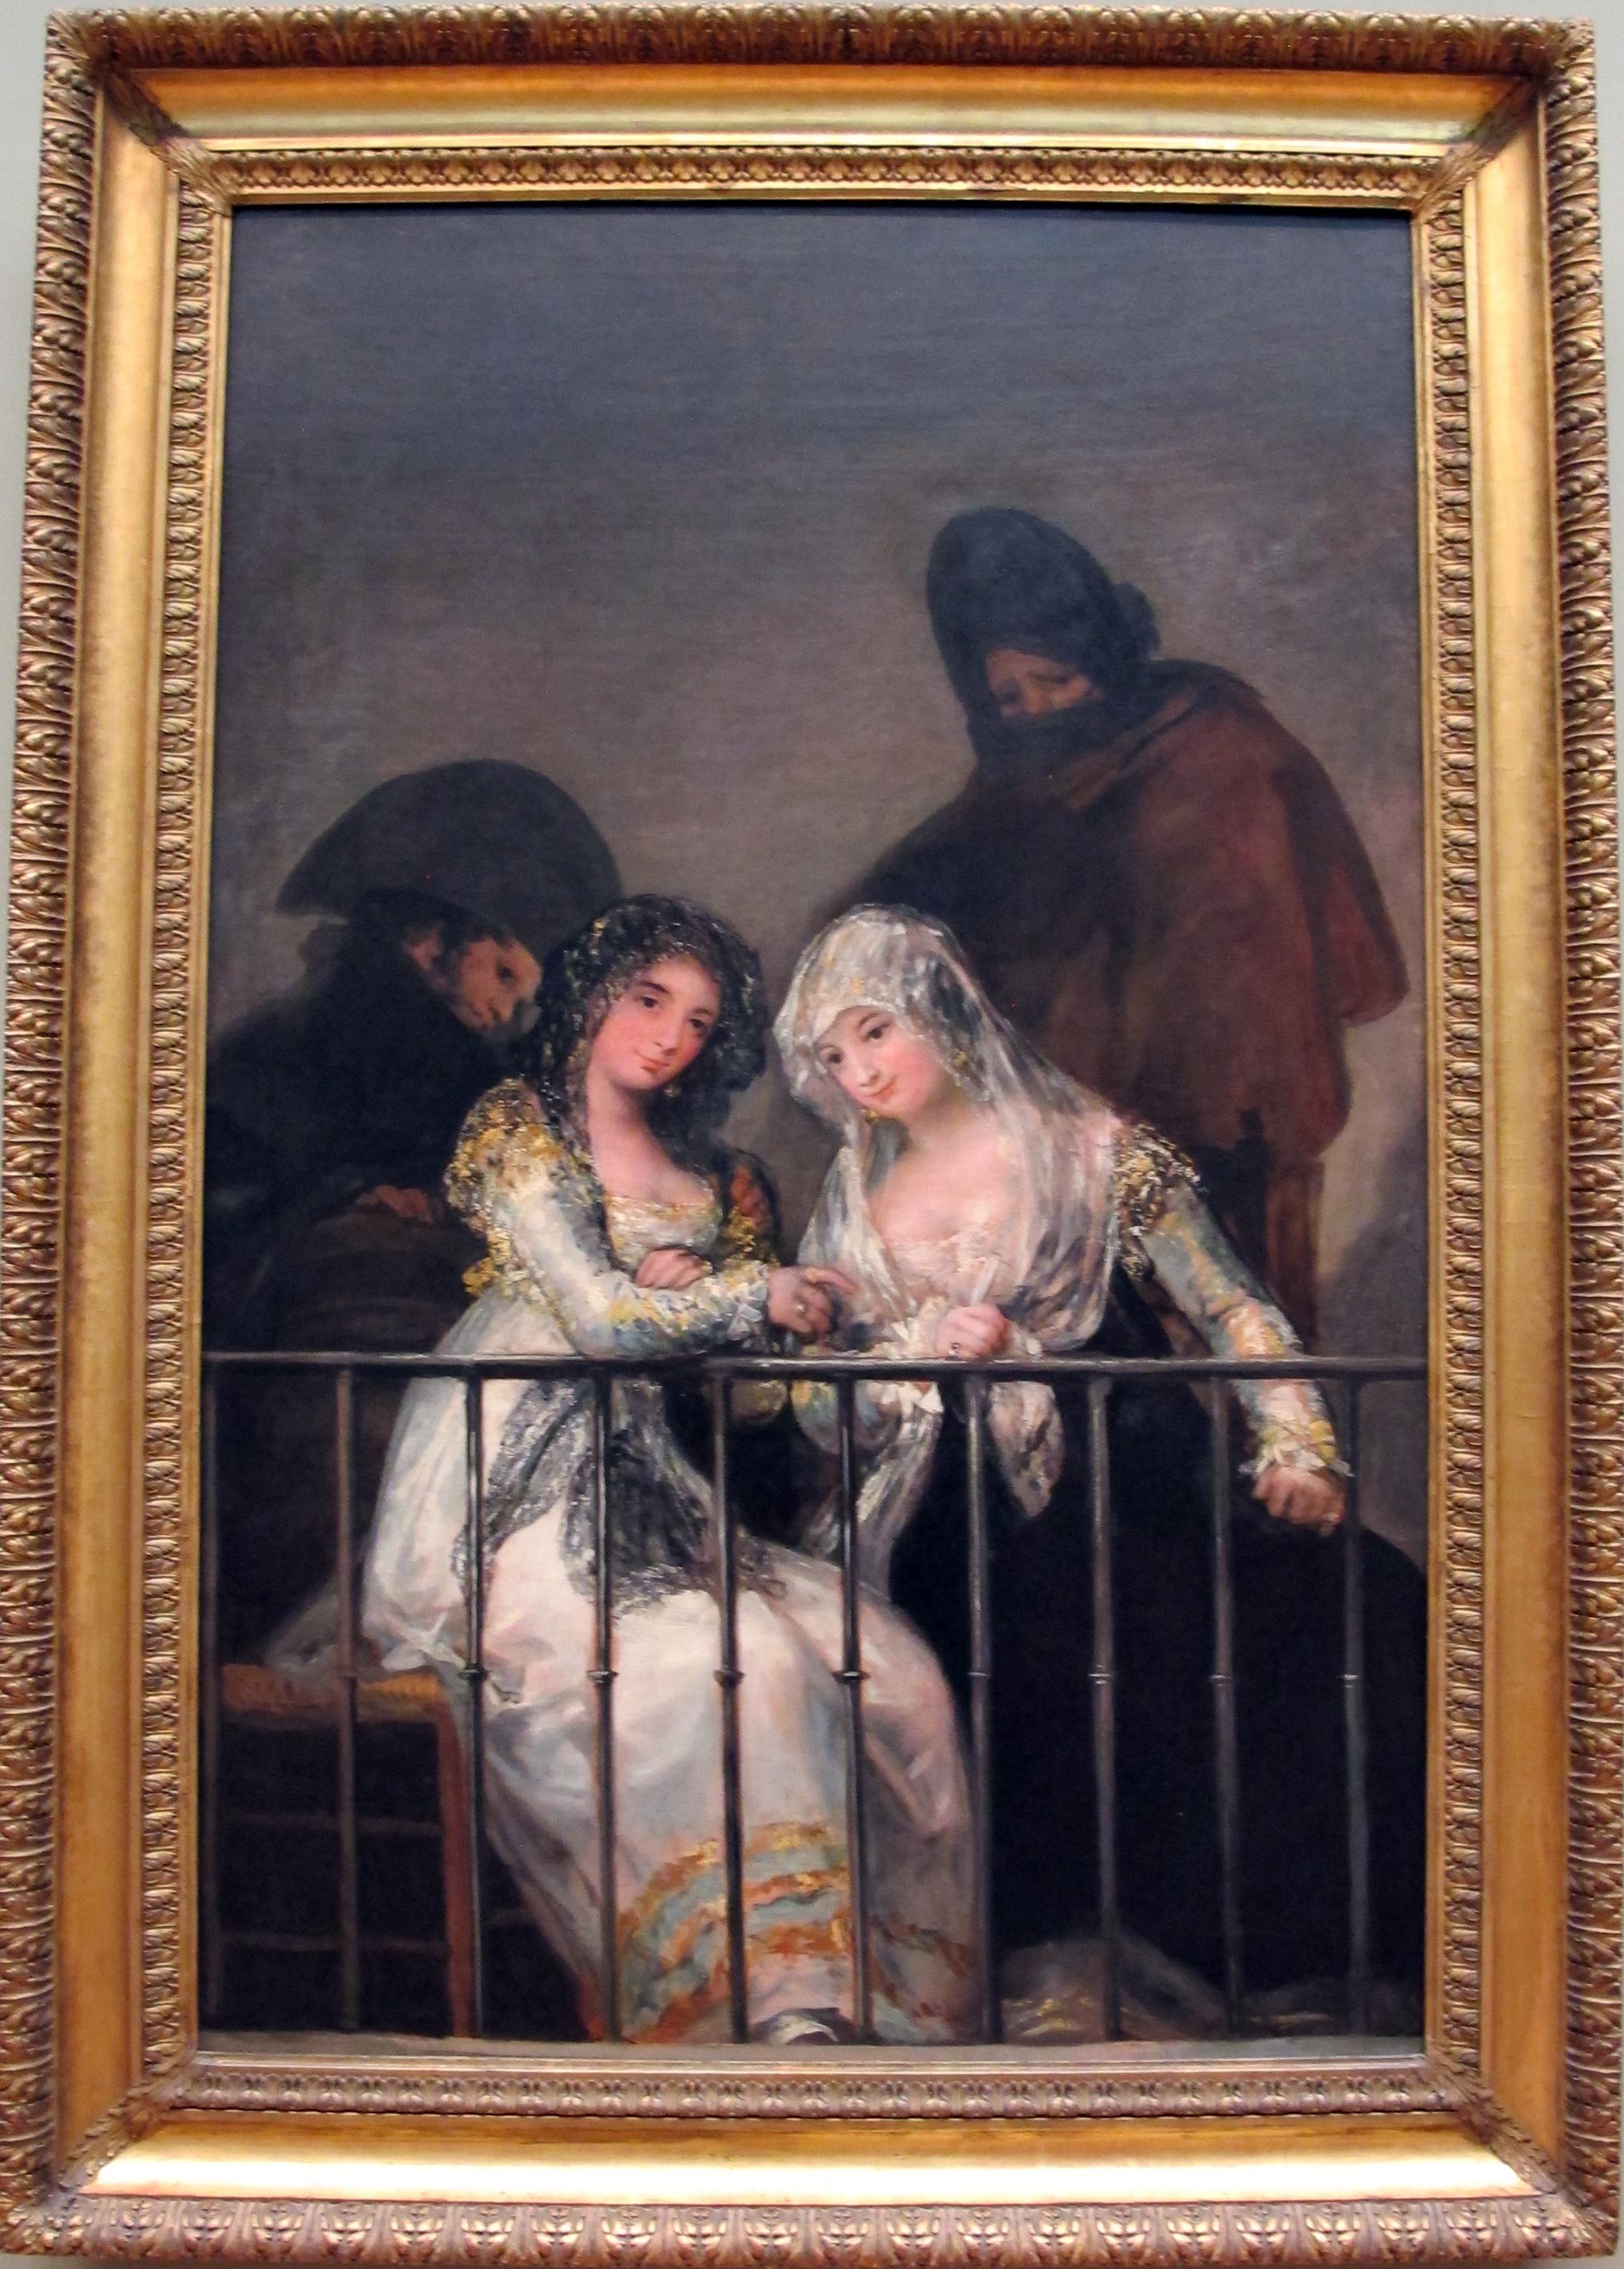 Babes in Goya